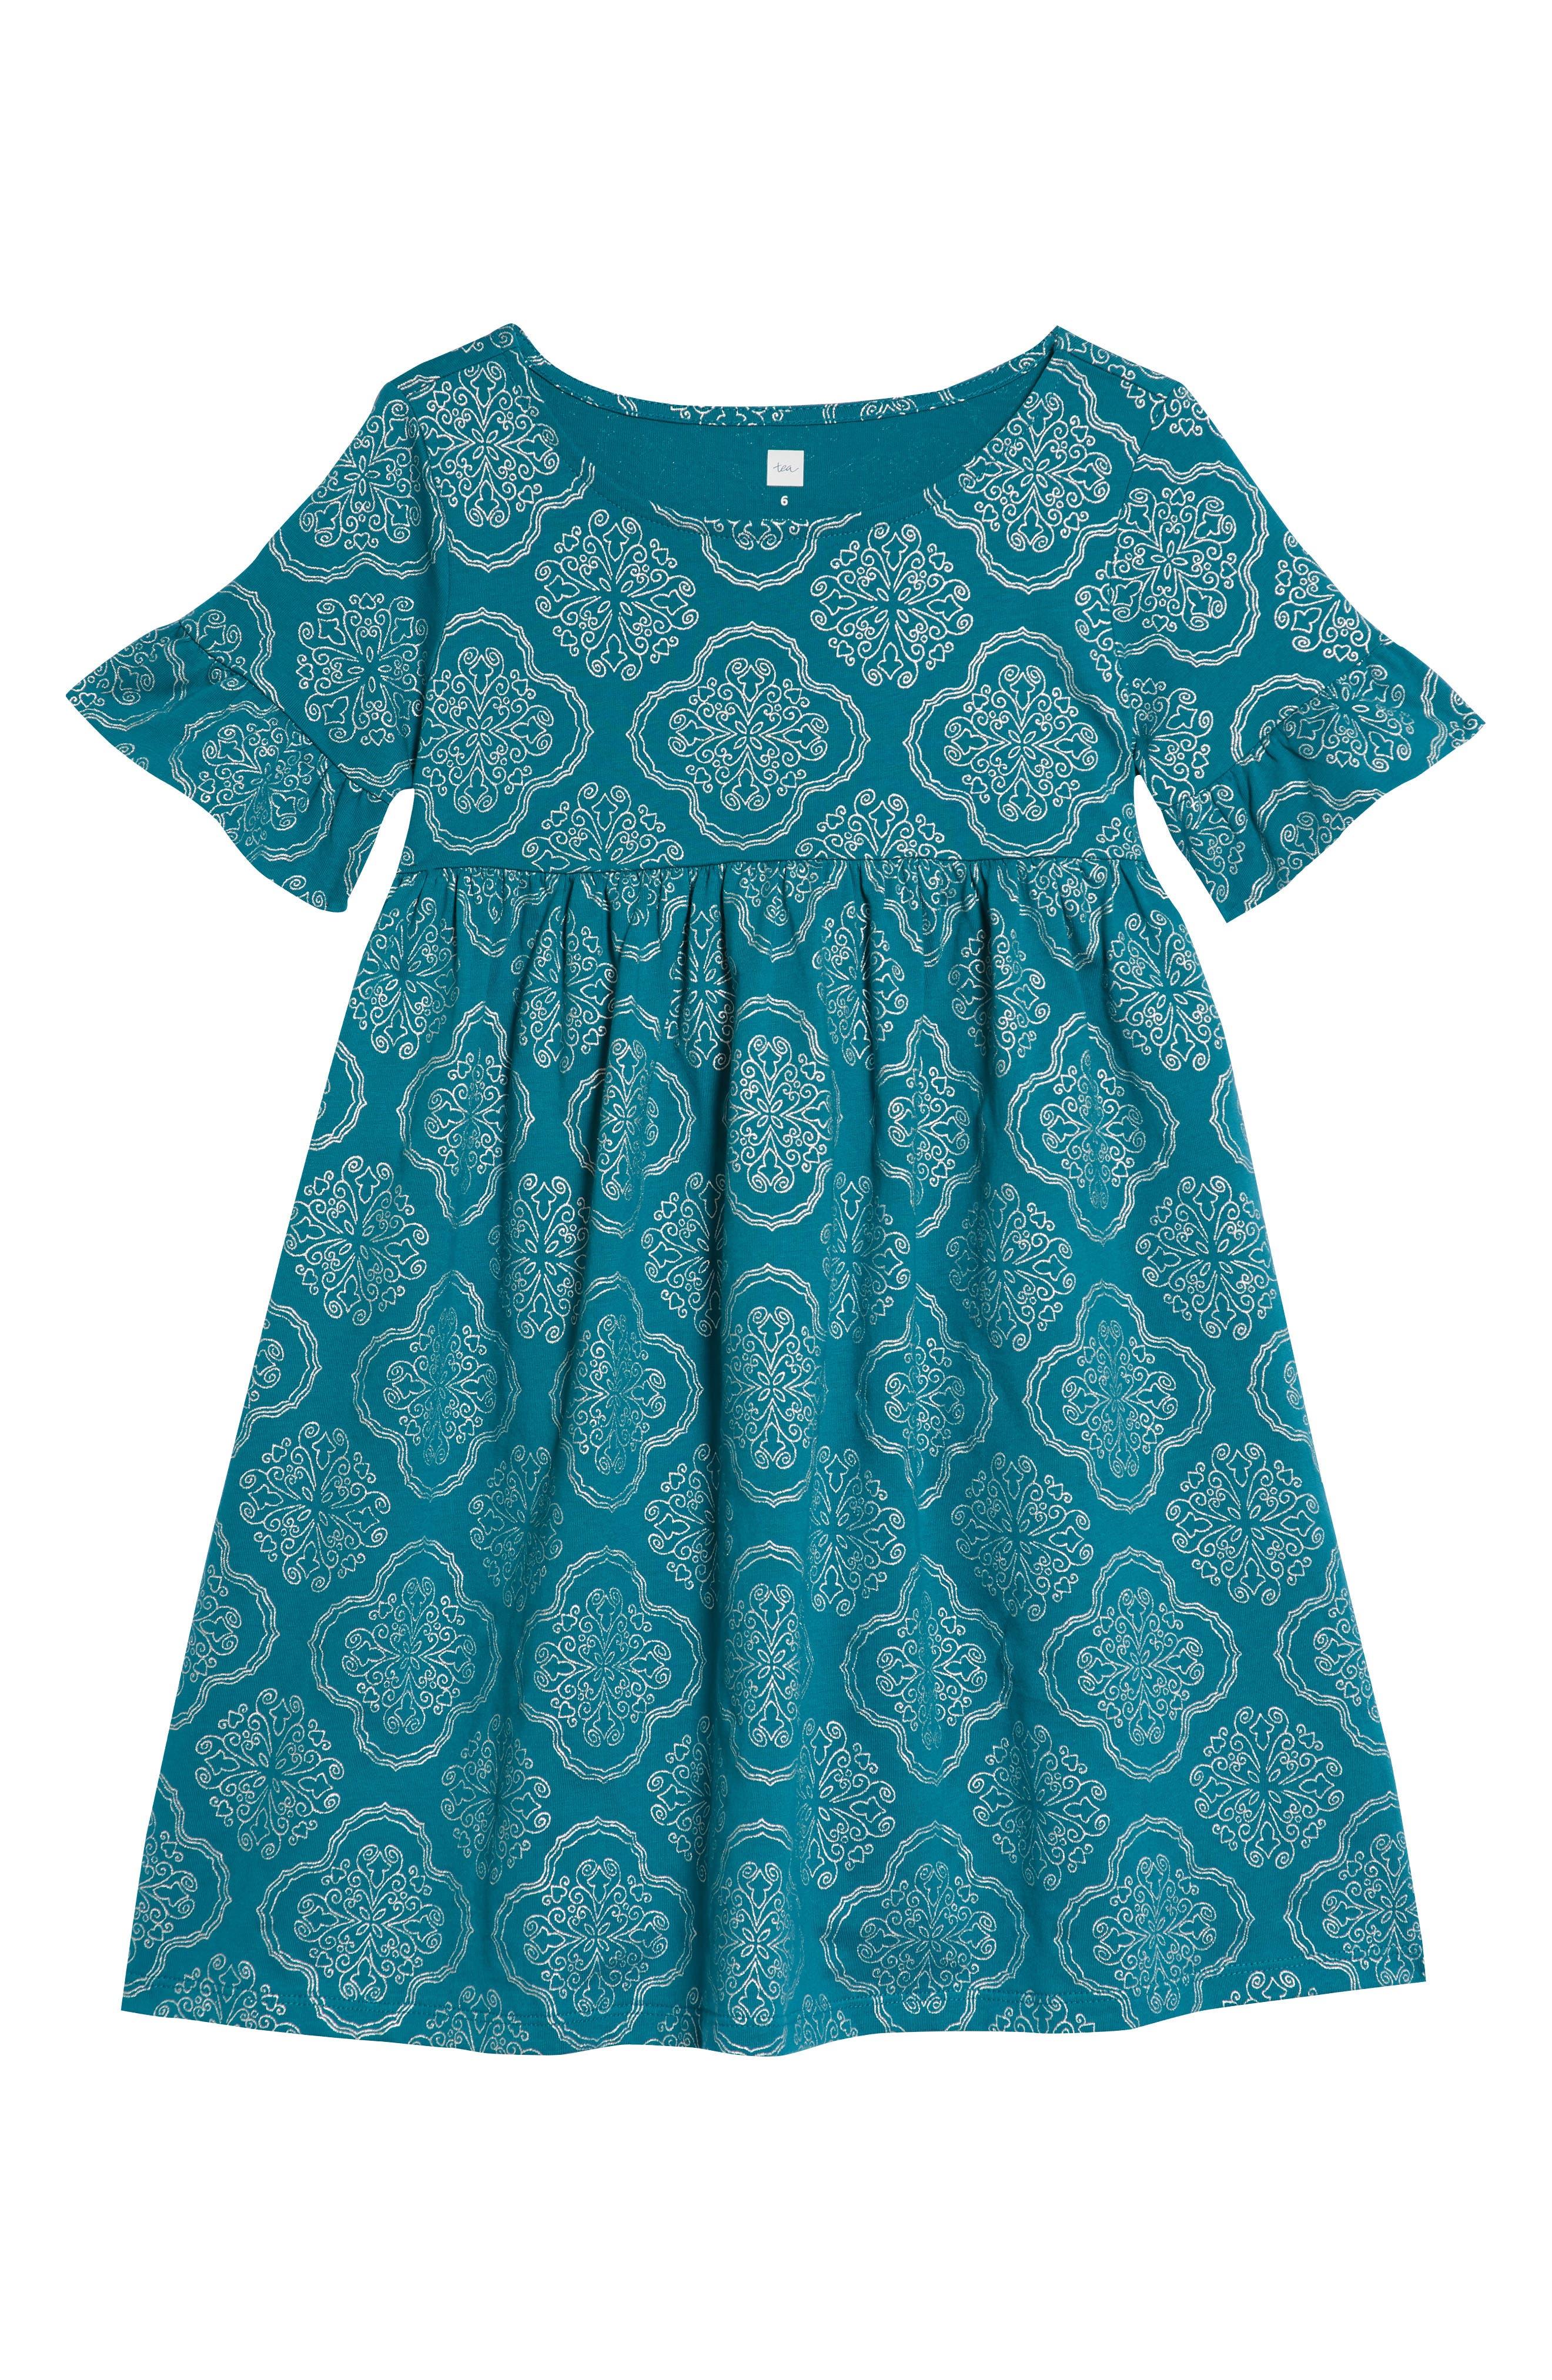 Ruffle Sleeve Dress,                             Main thumbnail 1, color,